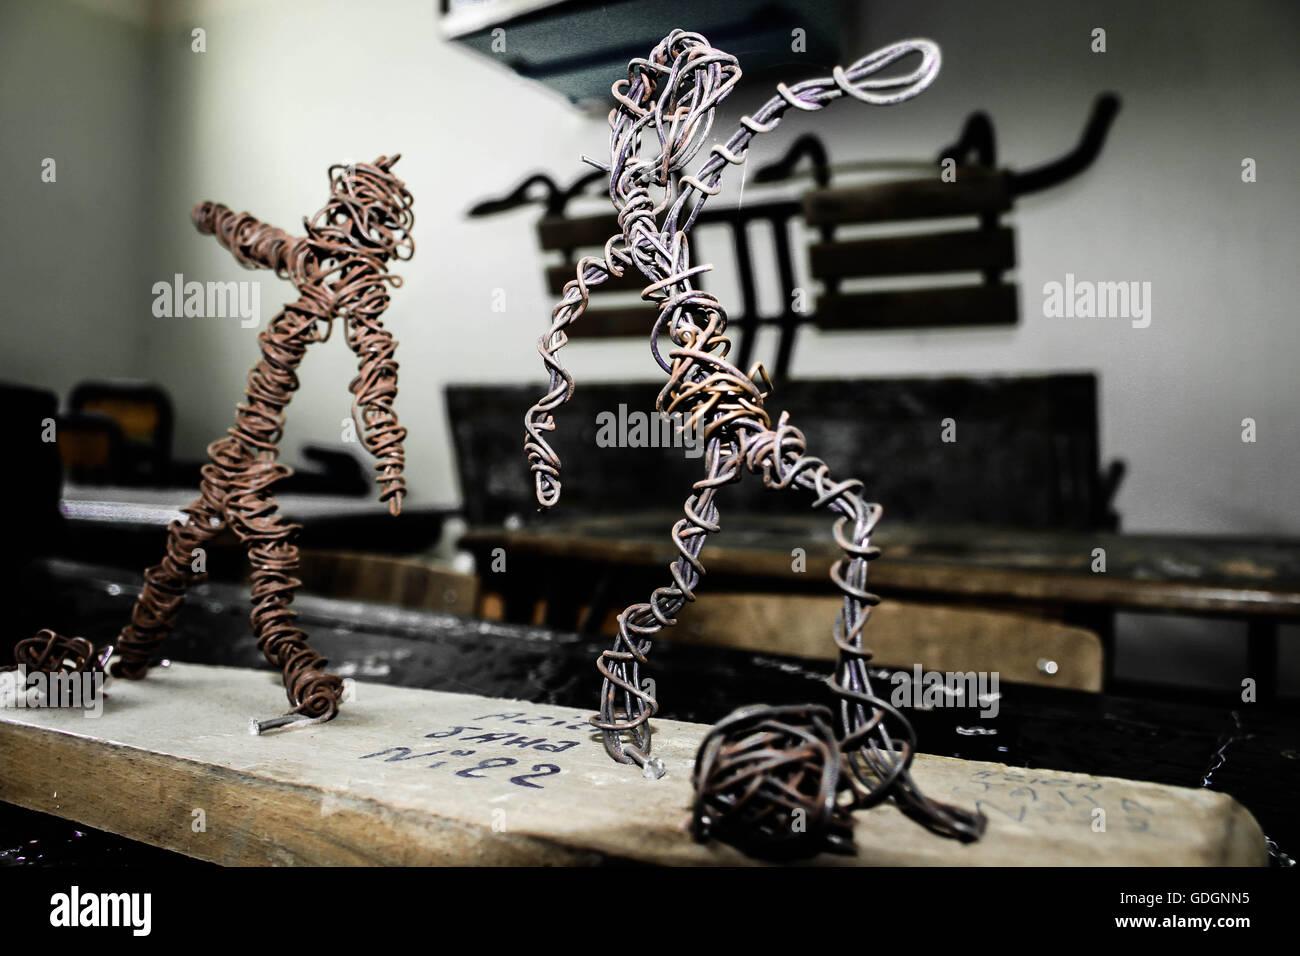 student creation - Stock Image